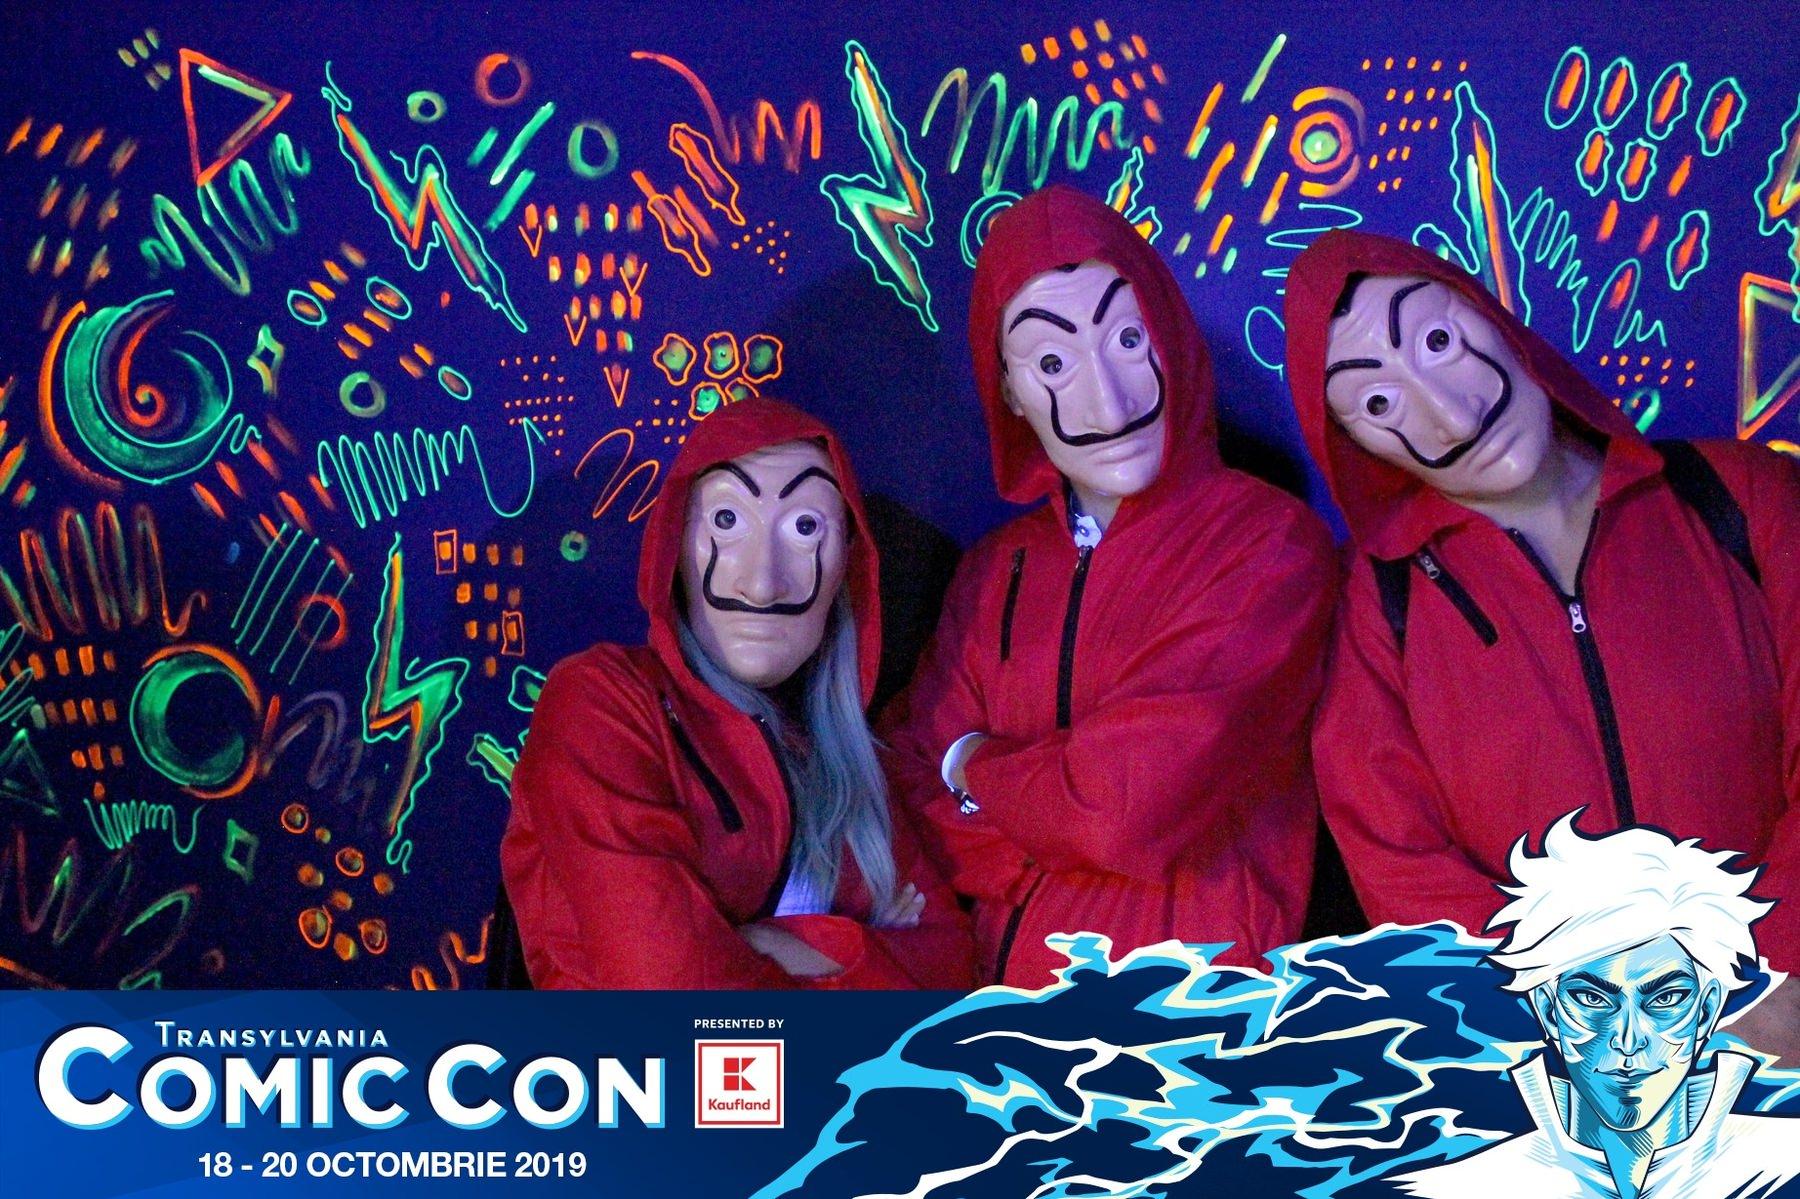 Activare-de-brand-Transylvania-Comic-Con-2019